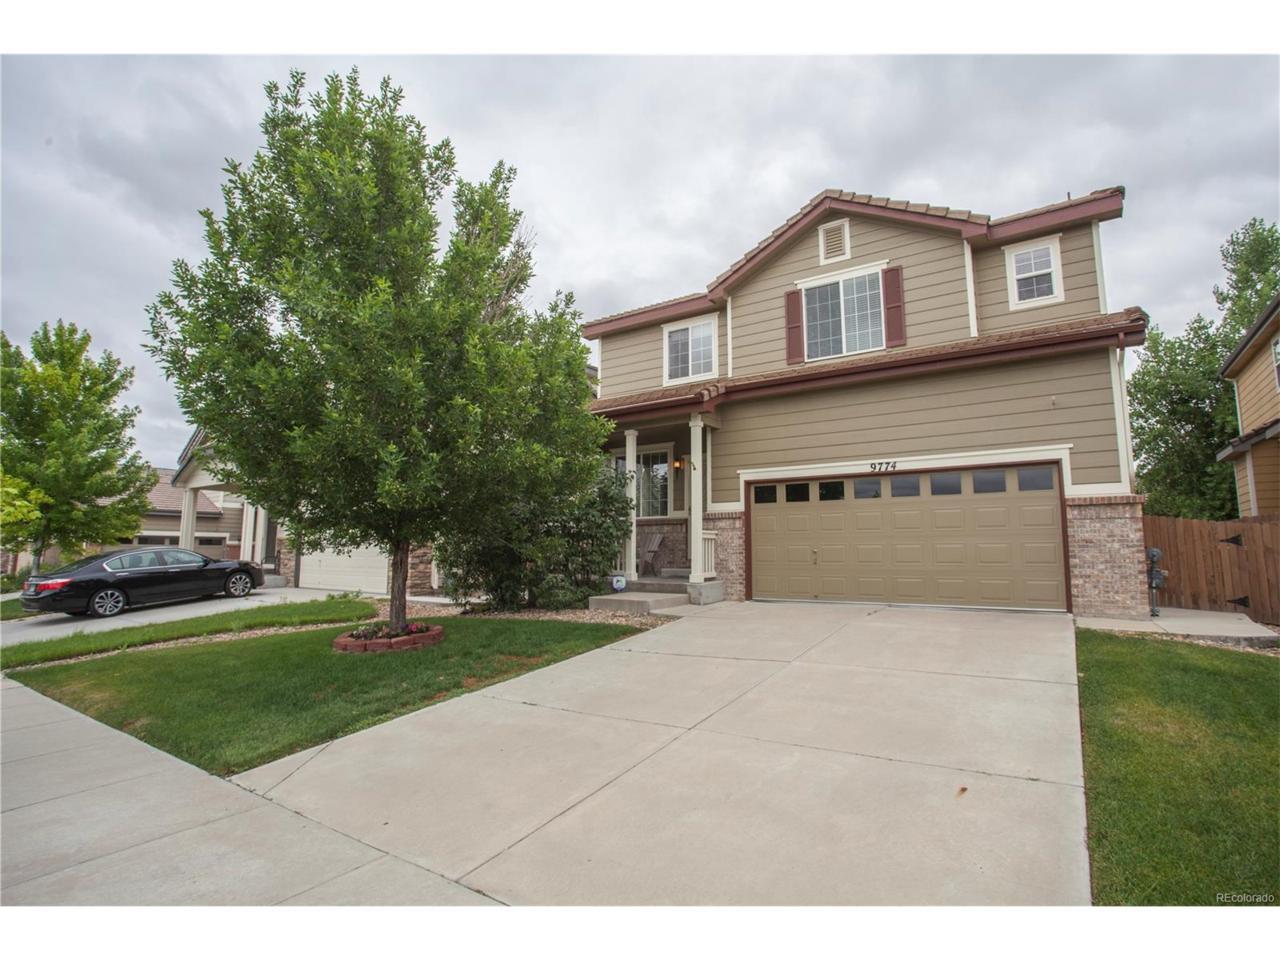 9774 Norfolk Street, Commerce City, CO 80022 (MLS #3726044) :: 8z Real Estate